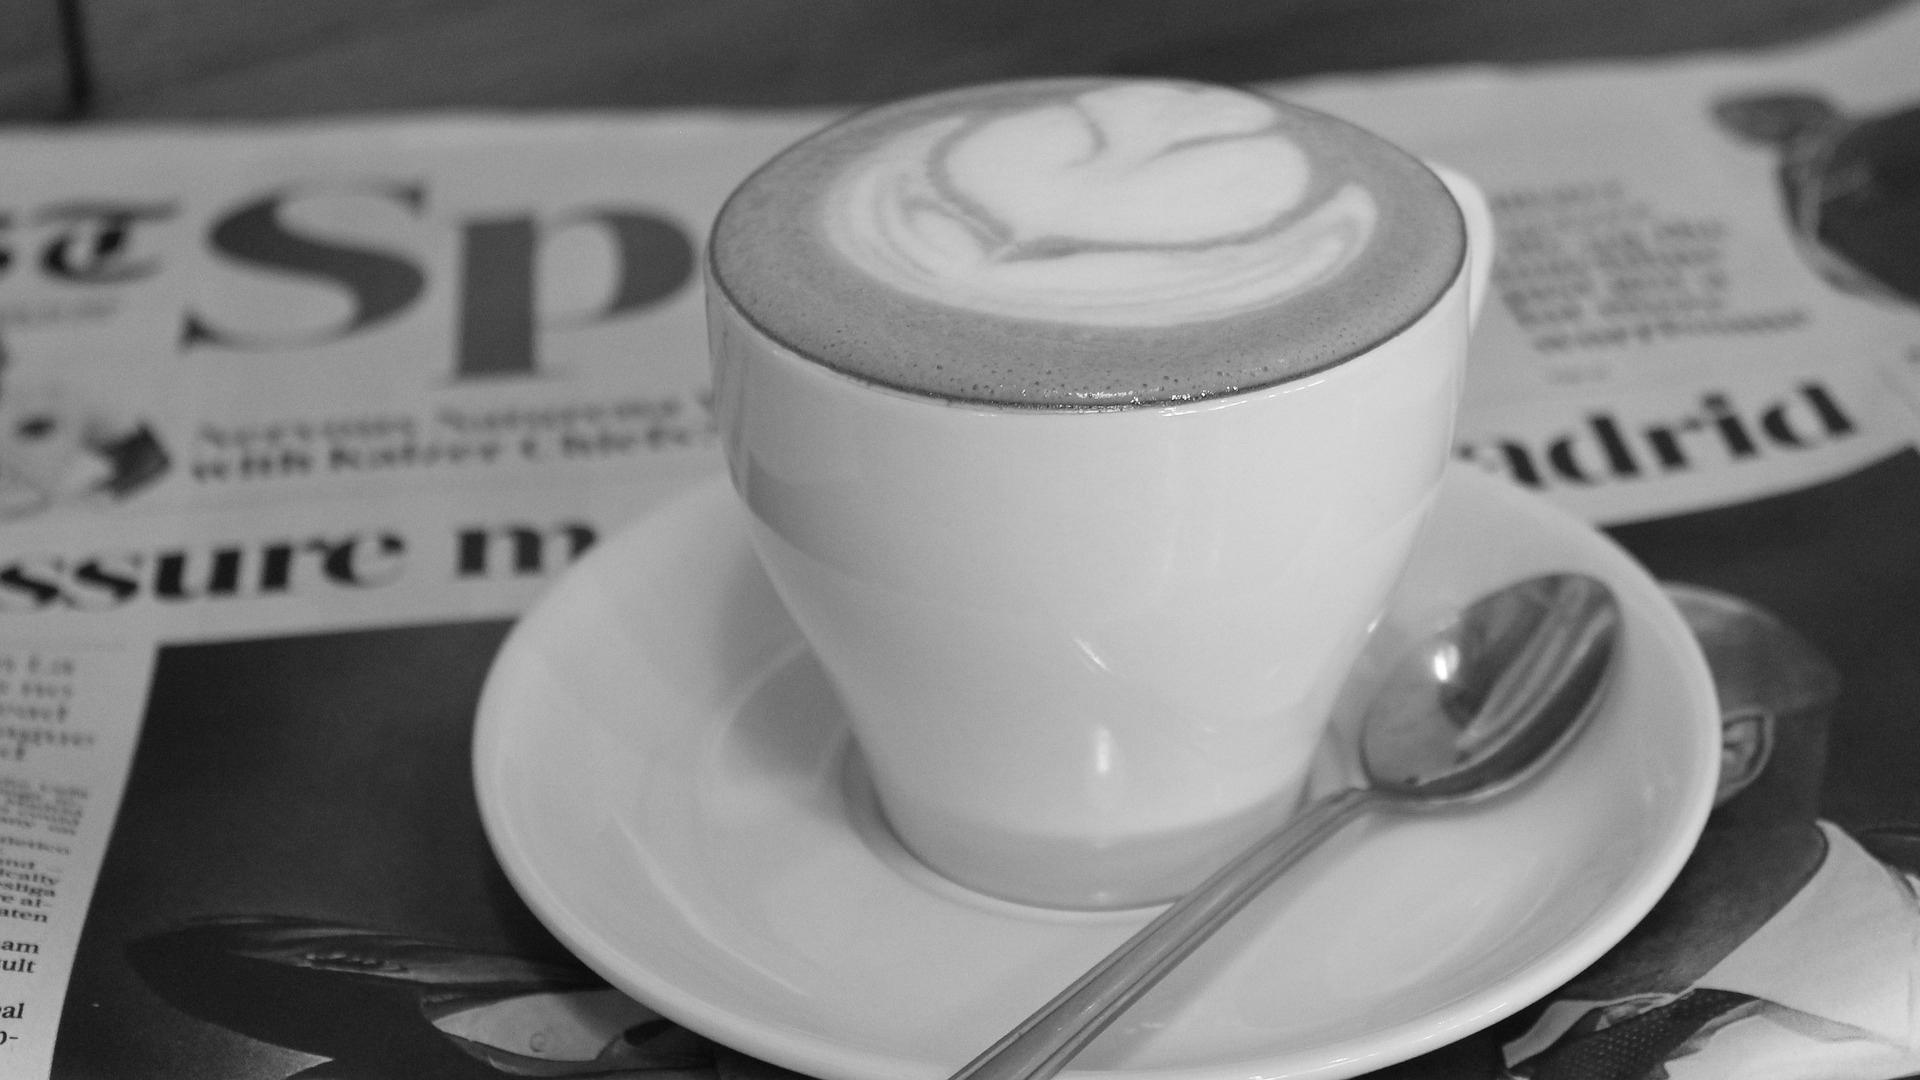 A macchiato with latte art sits atop a newspaper